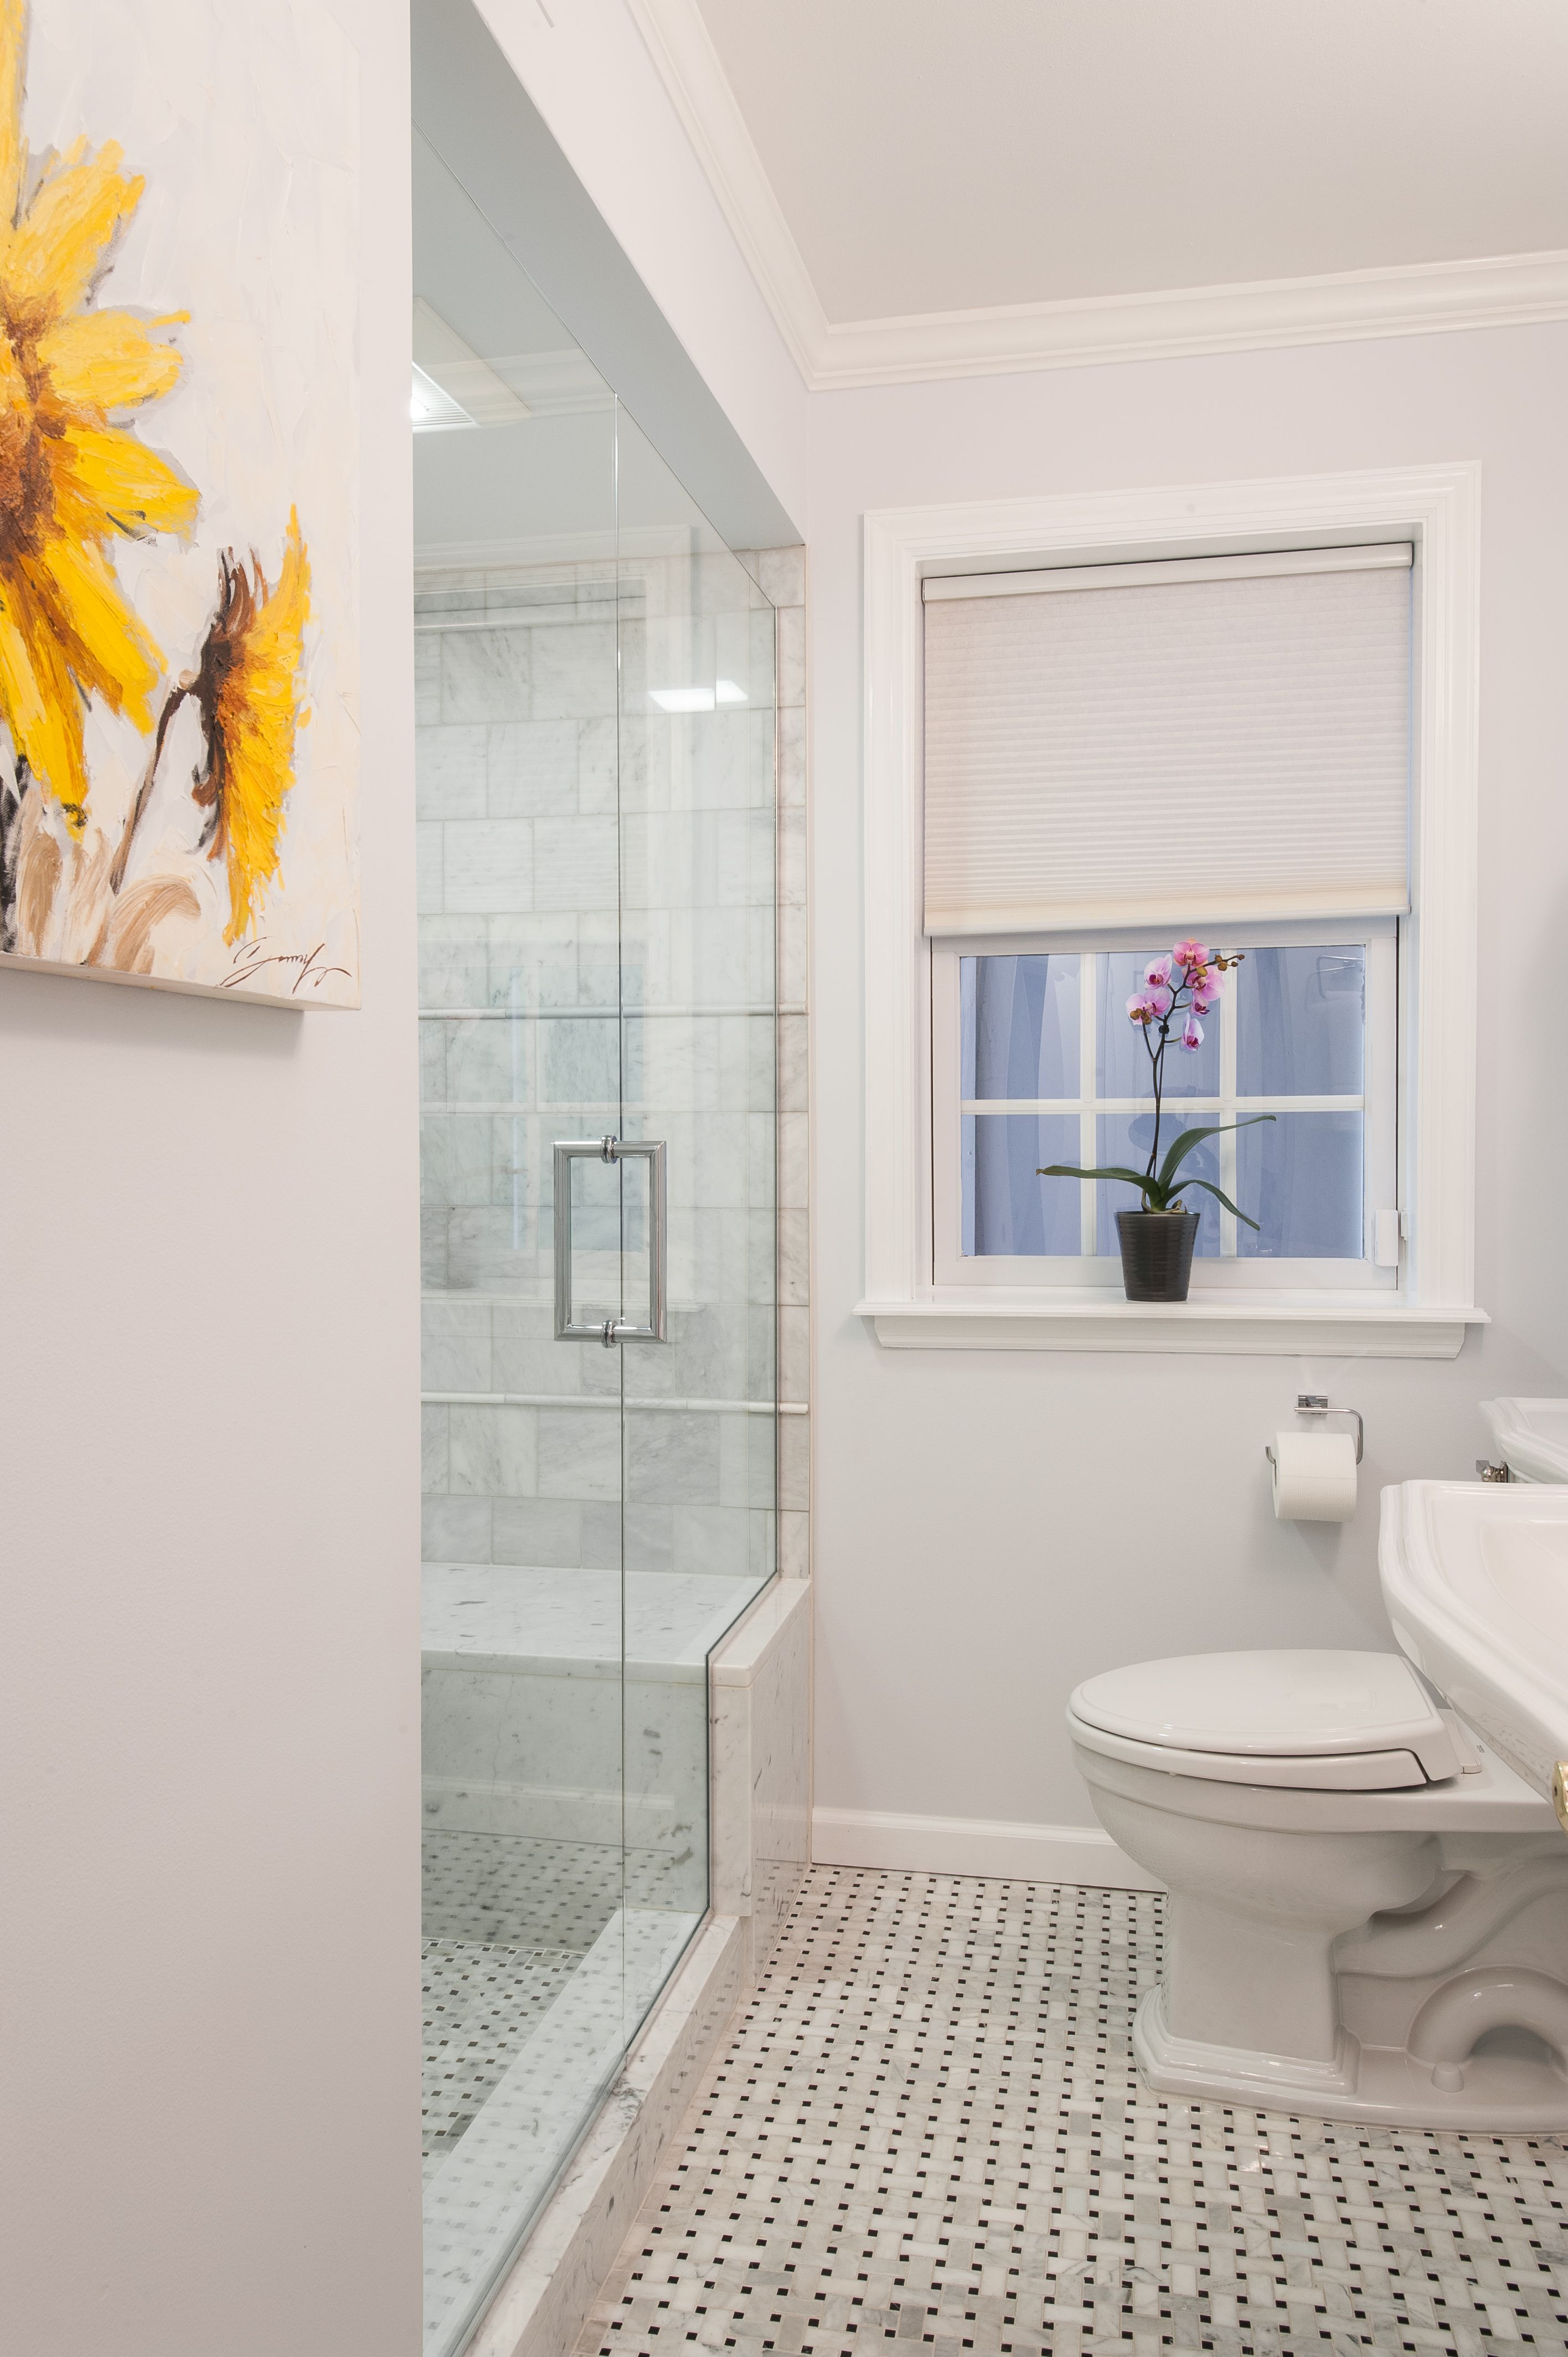 Small Bathroom That S Okay Pairing A Simple Wall With A Fun Floor Will Make It Appear More Spacio Small Bathroom Inspiration Modern Bathroom Tile Bath Girls Simple bathroom for girls